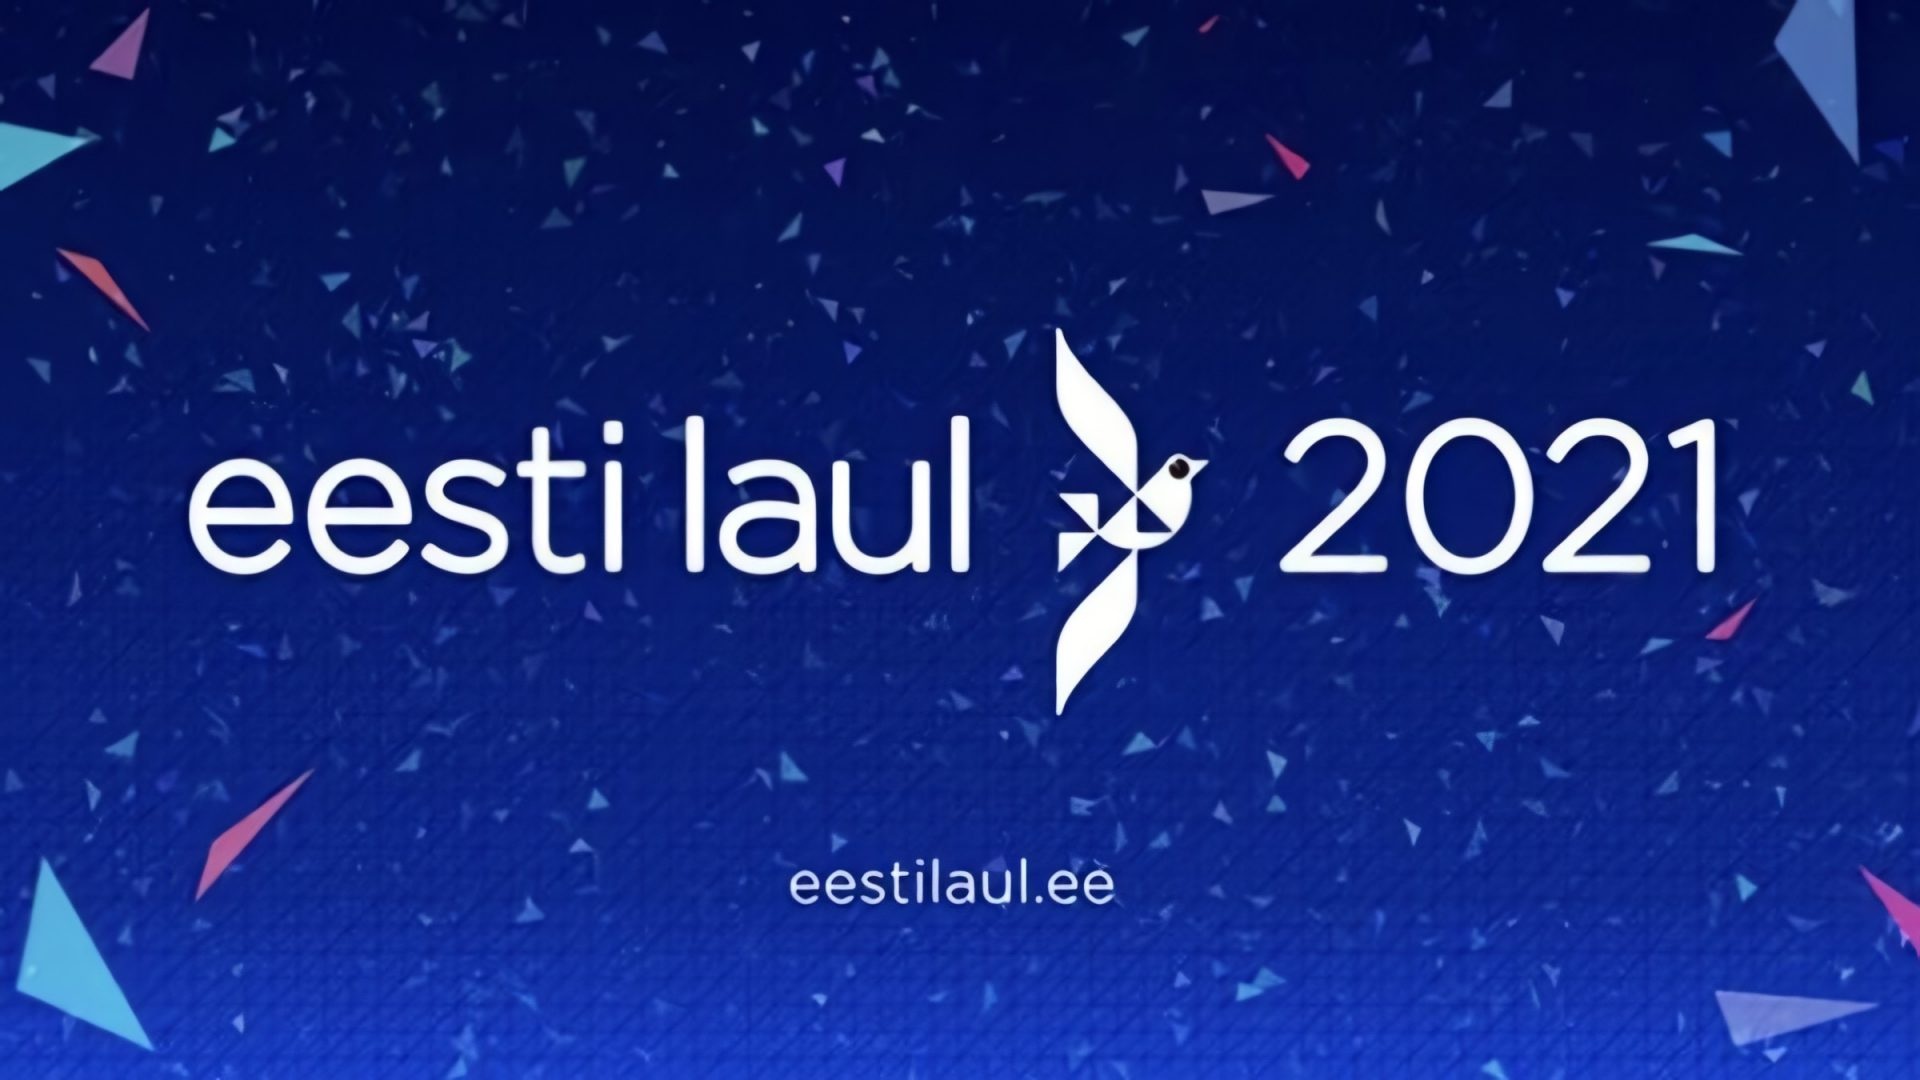 Eesti laul 2021 betting odds online cricket betting websites in england